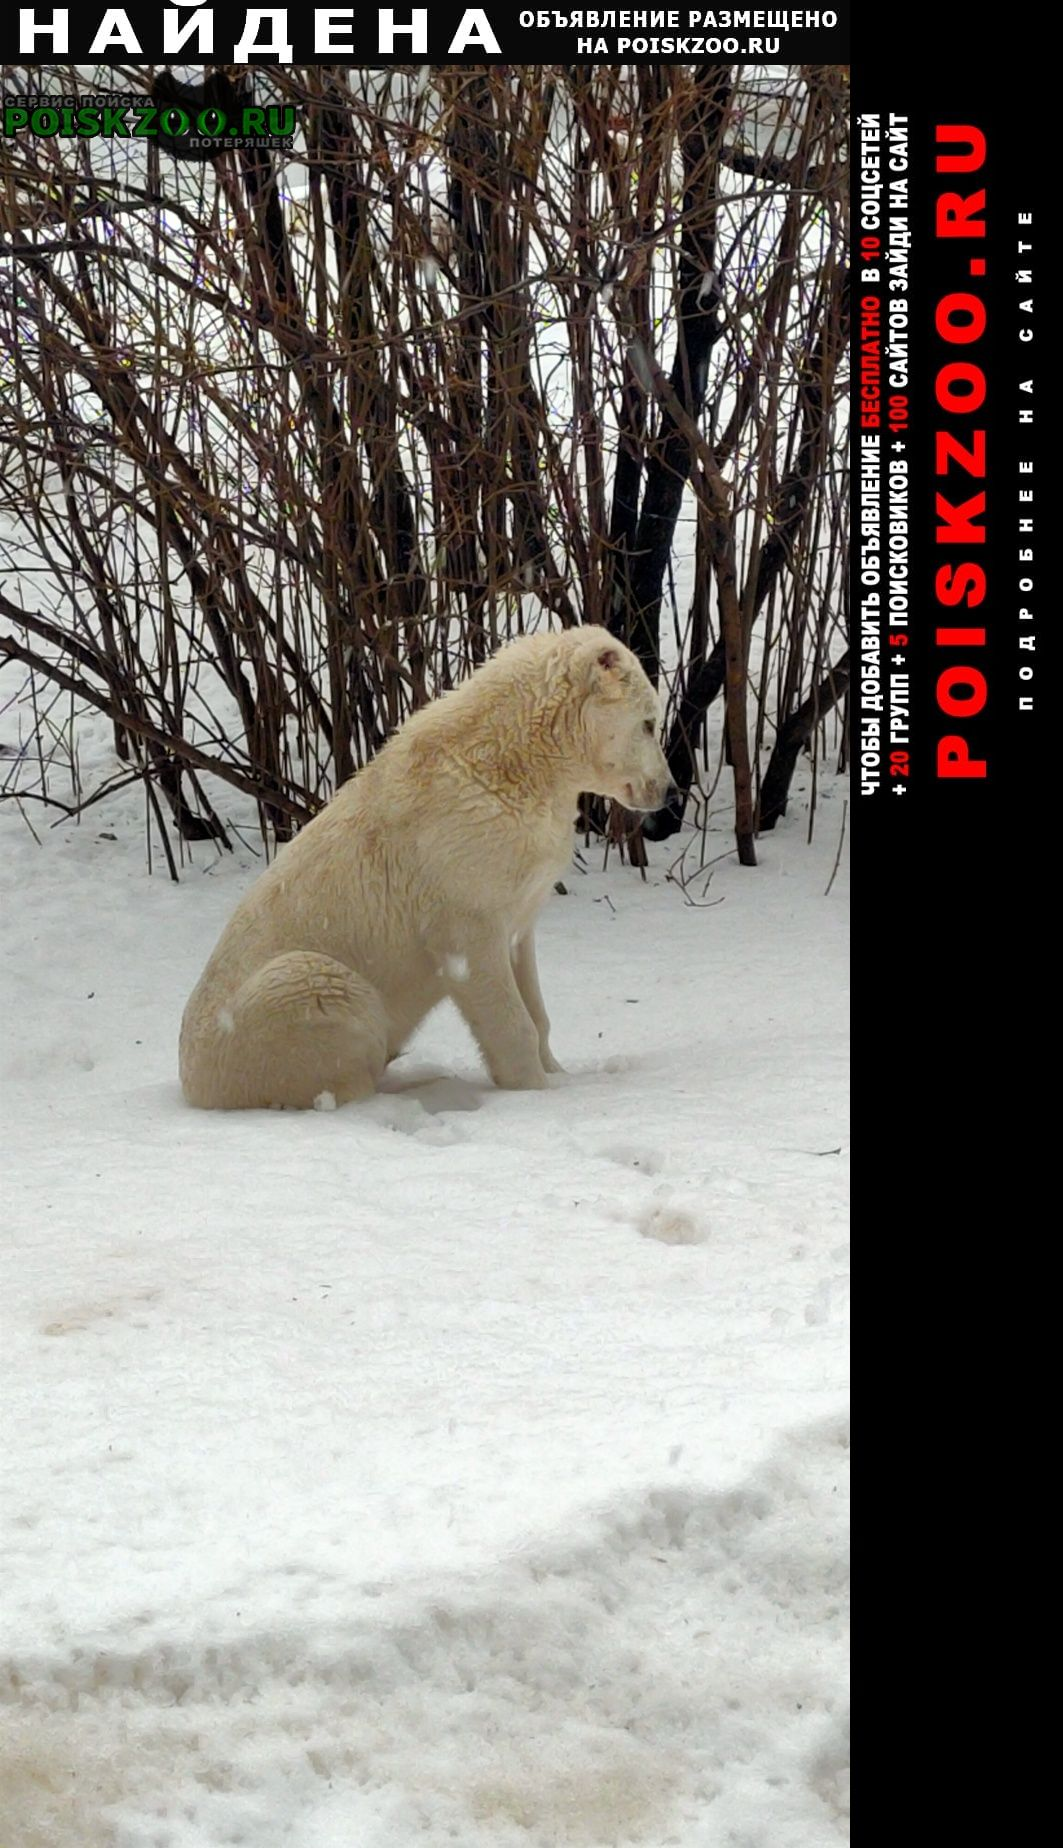 Найдена собака алабаи Нижний Новгород